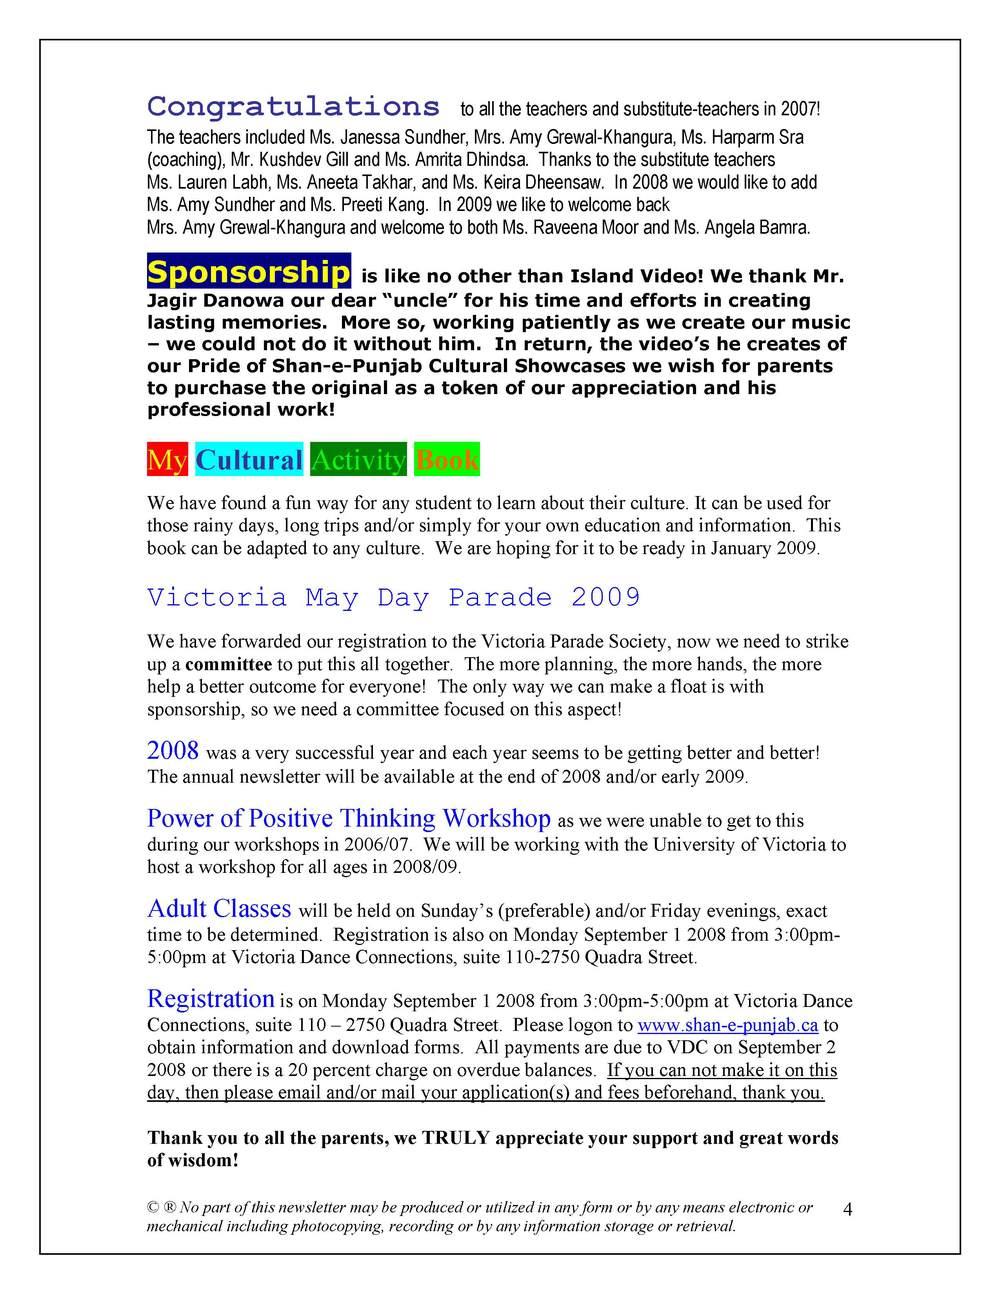 Newsletter 2007_Page_4.jpg